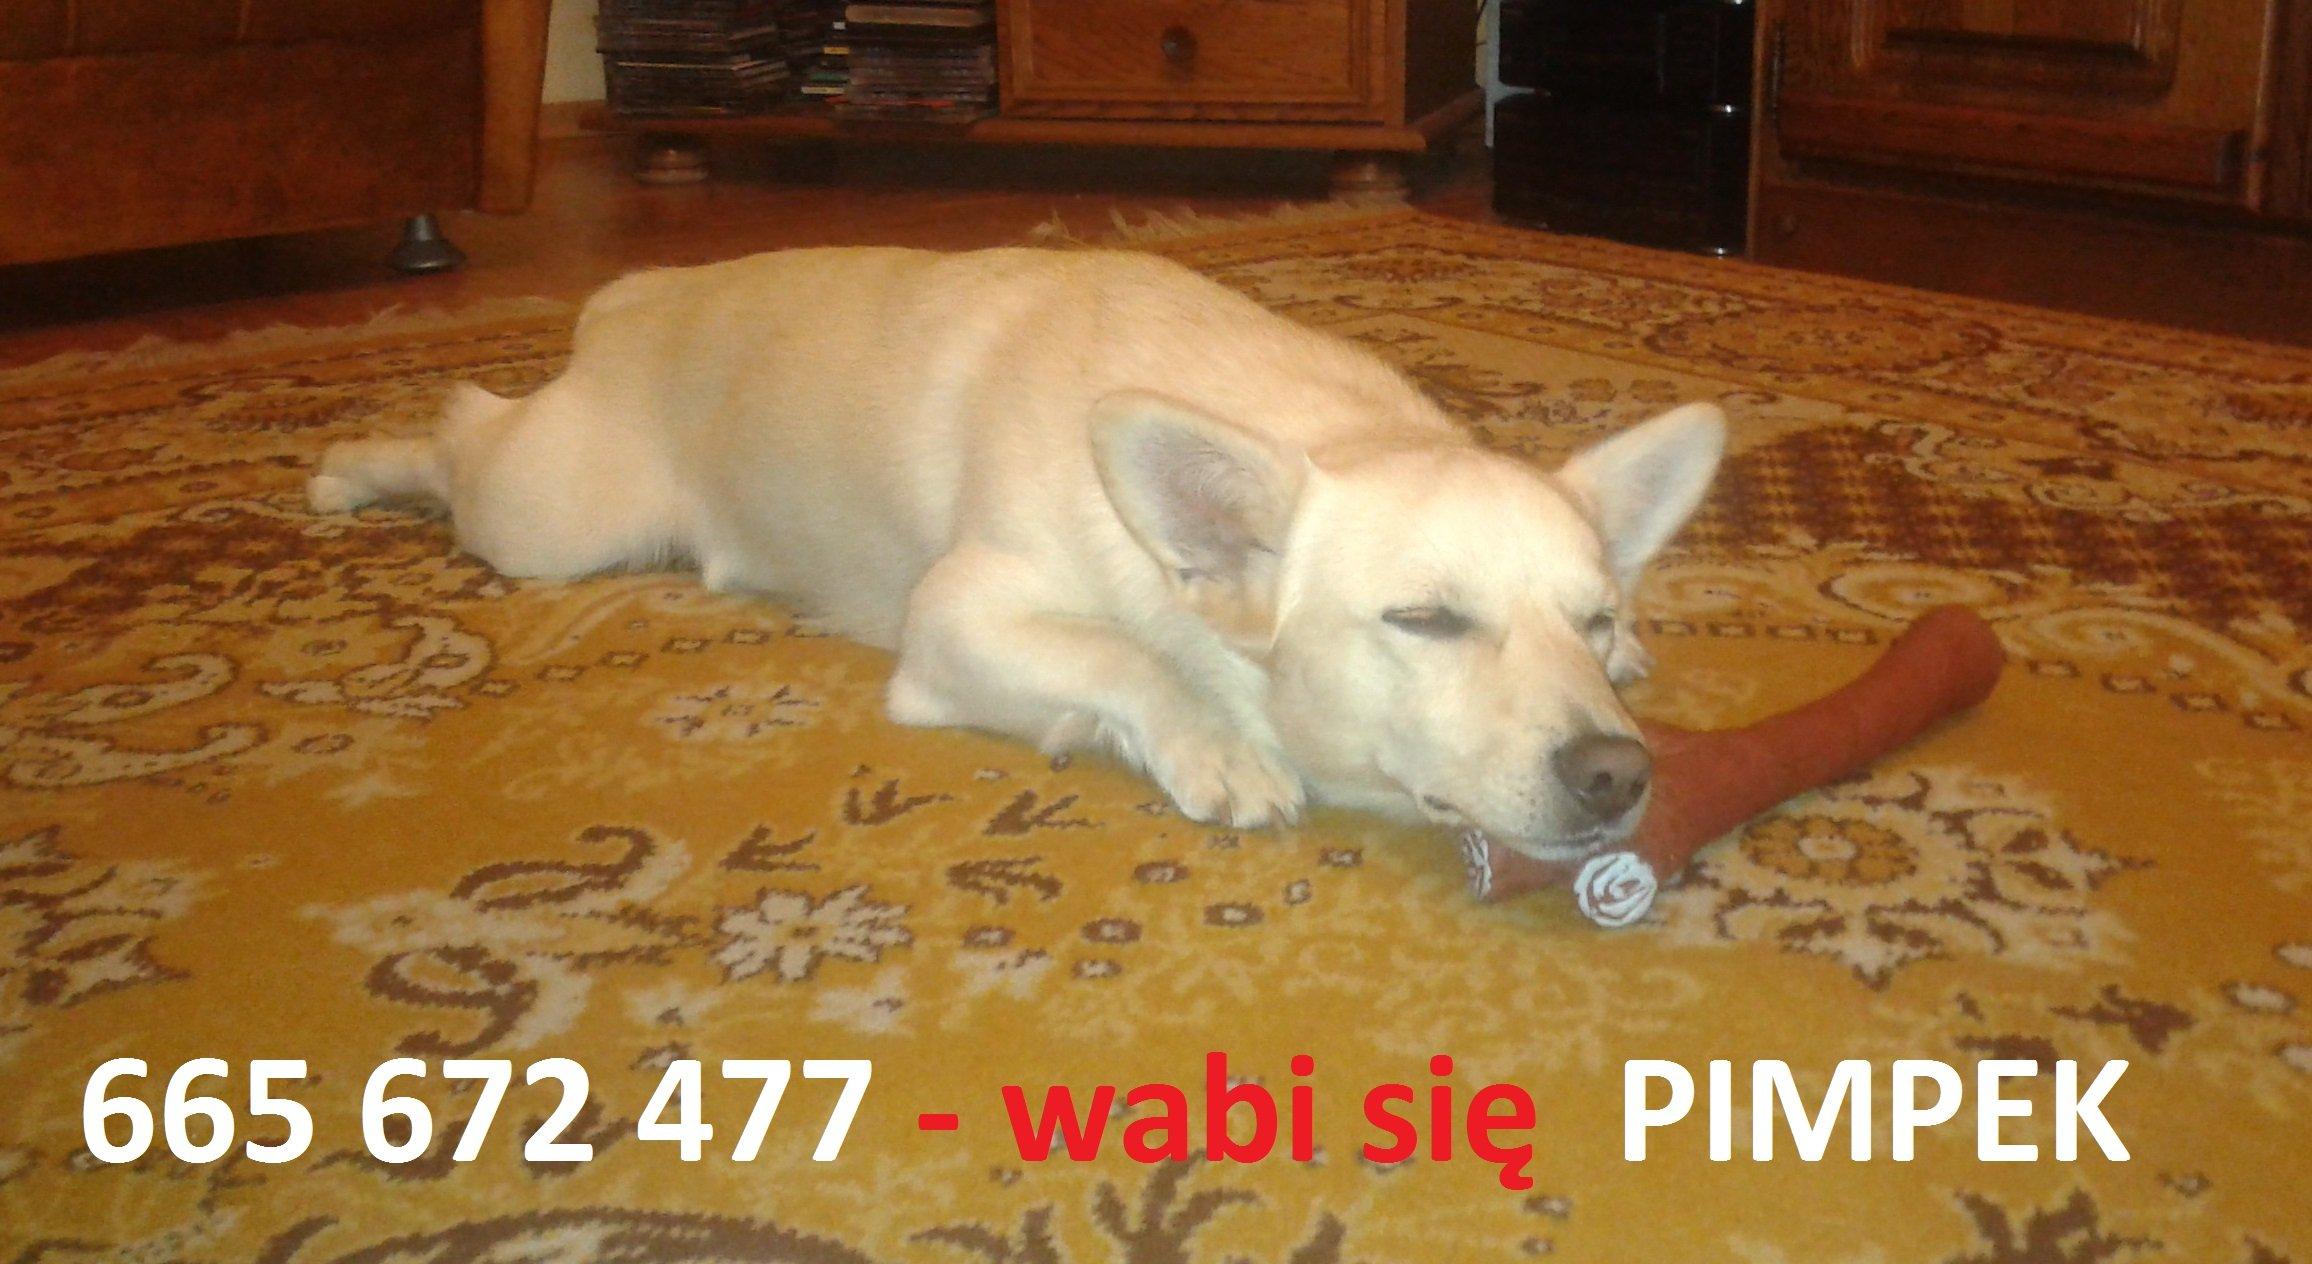 Uciekł pies - PIMPEK - BISZKOPTOWY KUNDEL